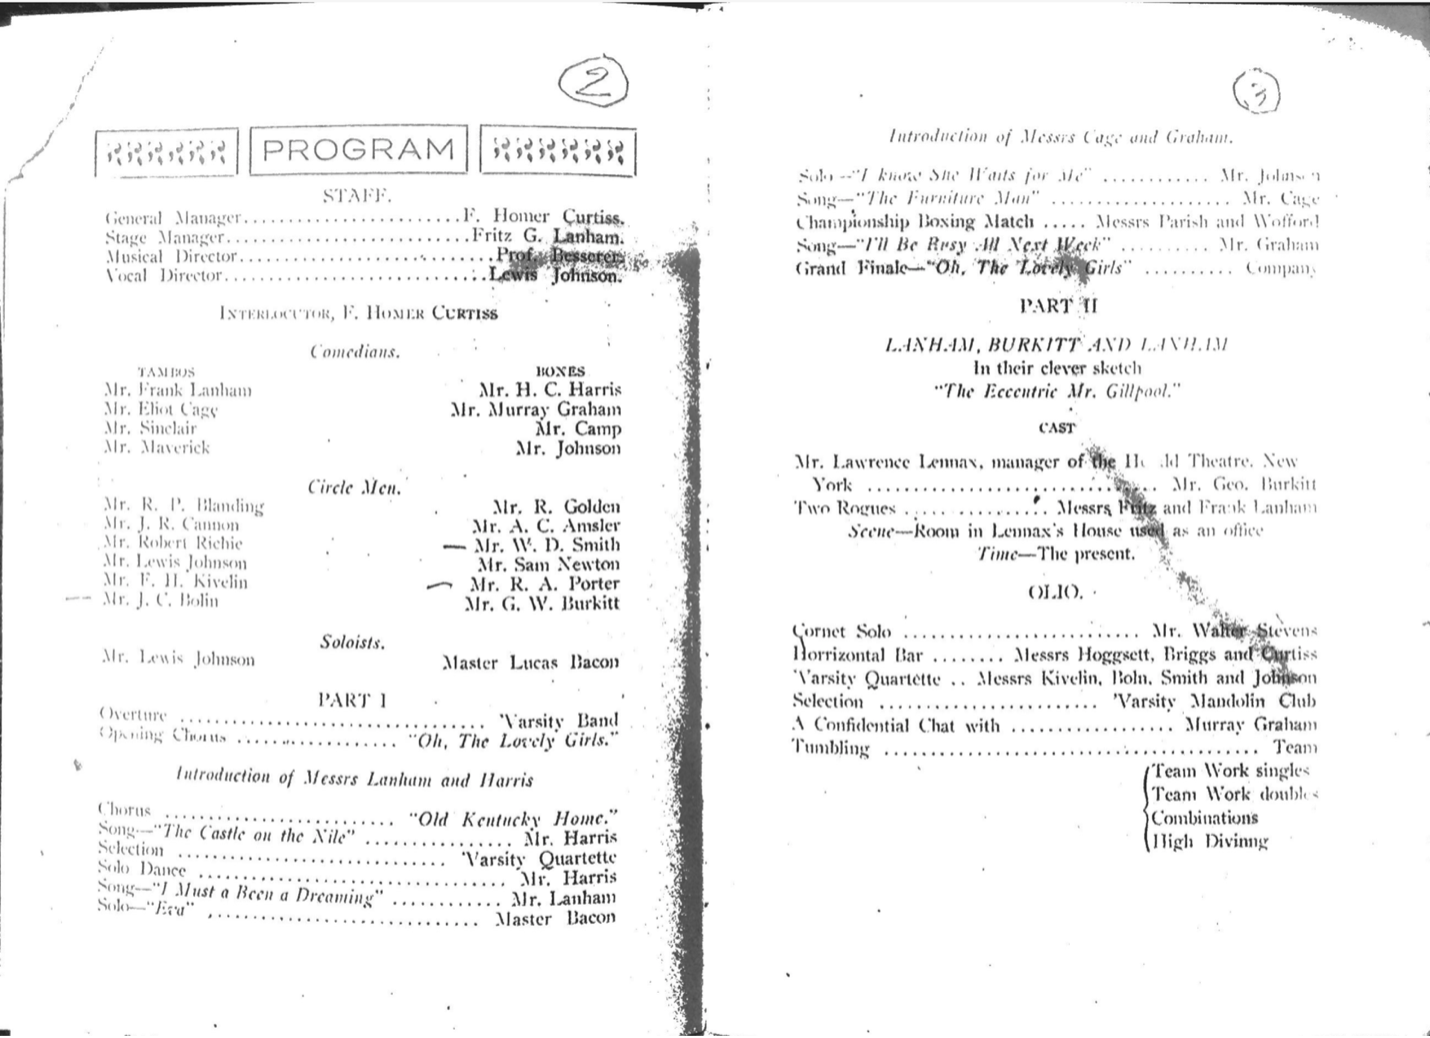 Inside program of the May 12, 1903 minstrel show.